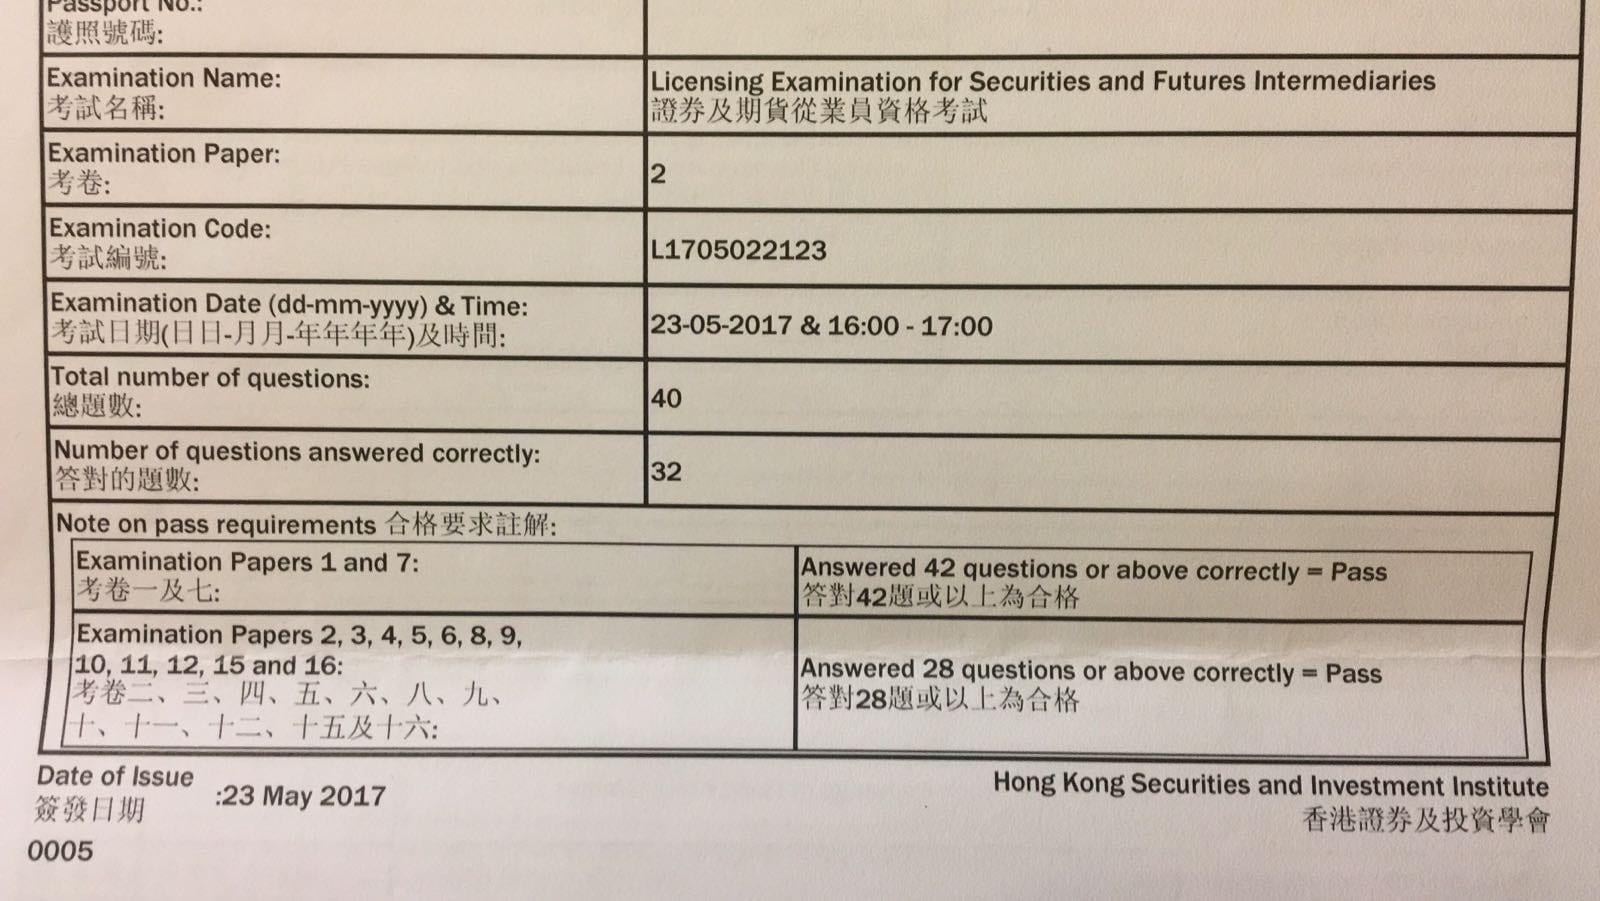 YKW 23/5/2017 LE Paper 2 證券期貨從業員資格考試卷二 Pass